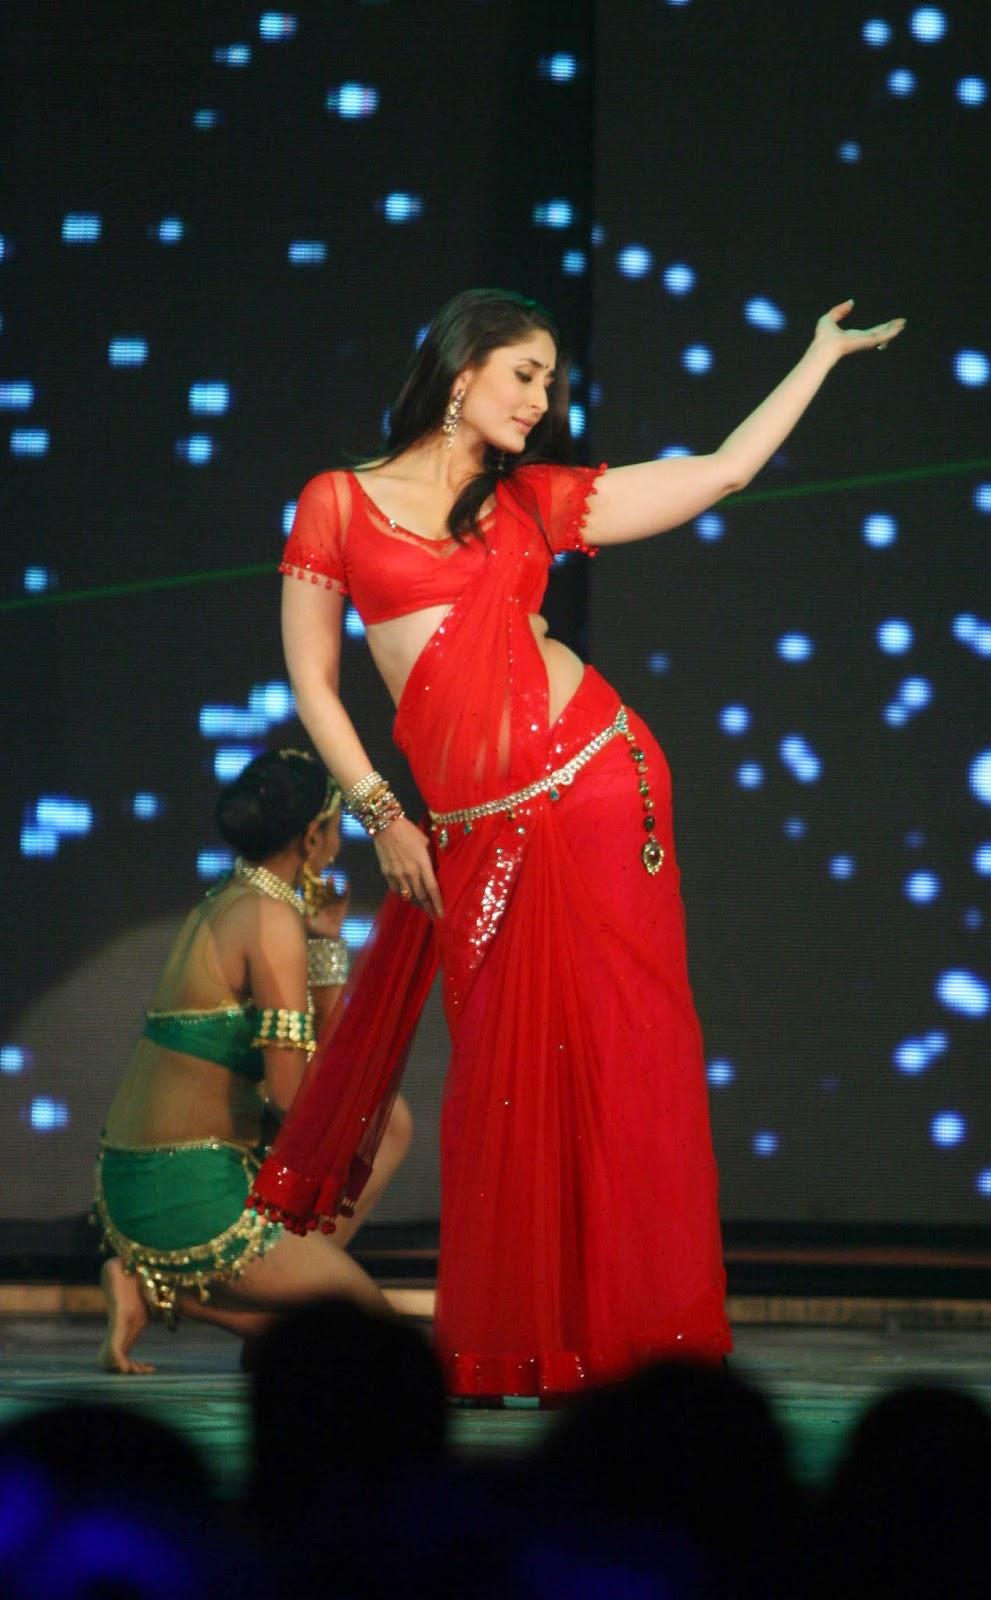 kareena kapoor in red saree at ra.one' audio launch event | stylish